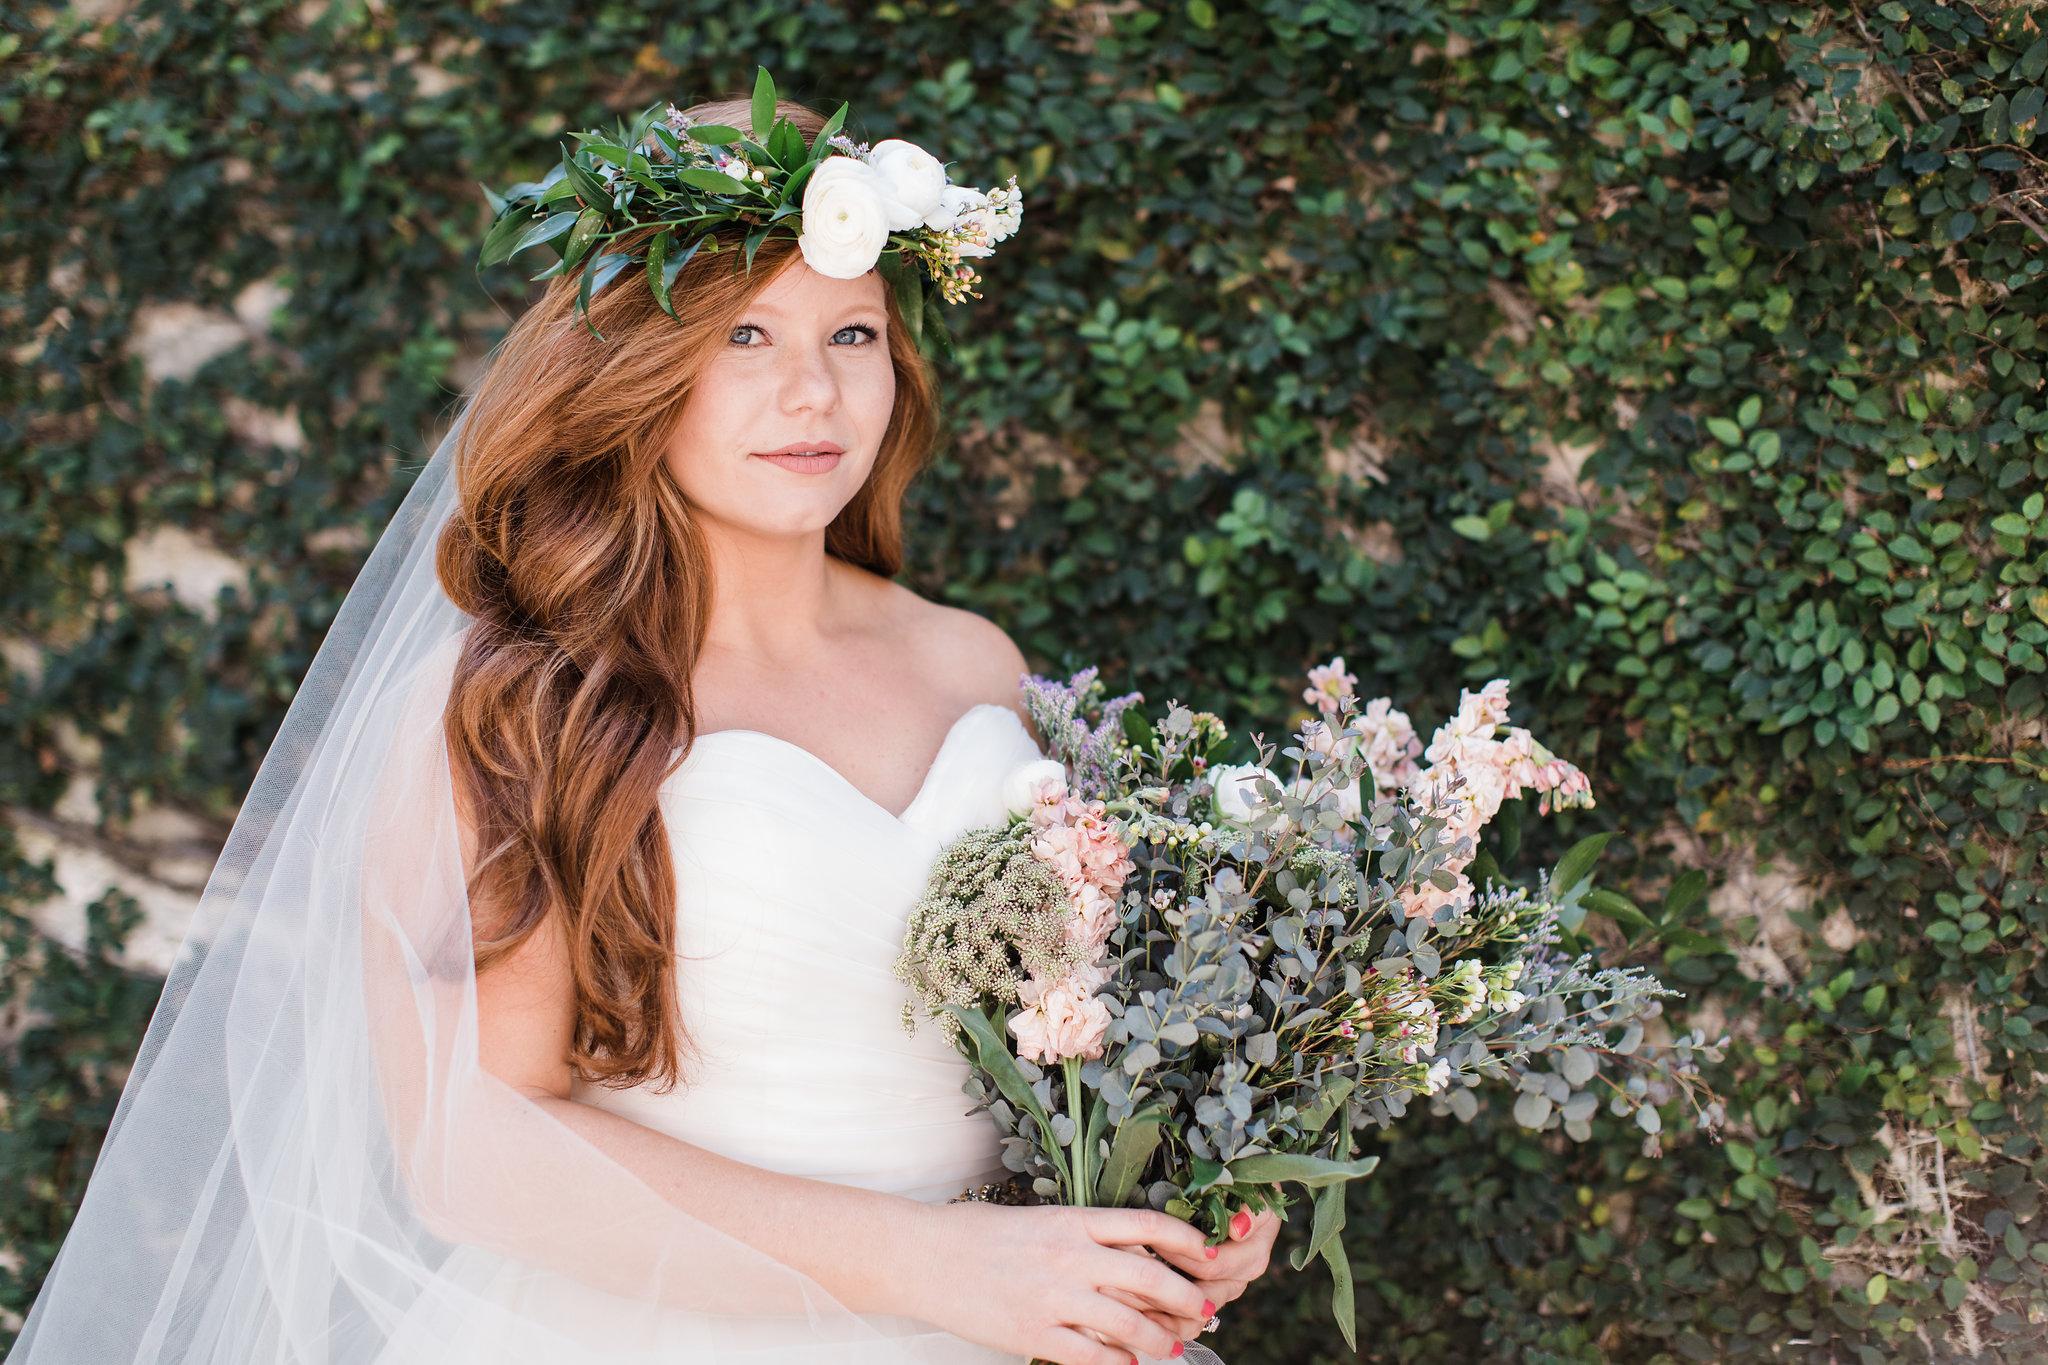 apt-b-photography-mary-elizabeths-bridal-boutique-adele-amelia-accessories-morilee-5504-savannah-bridal-boutique-savannah-weddings-savannah-wedding-photographer-savannah-bridal-gowns-savannah-wedding-dresses-historic-savannah-wedding-5.jpg